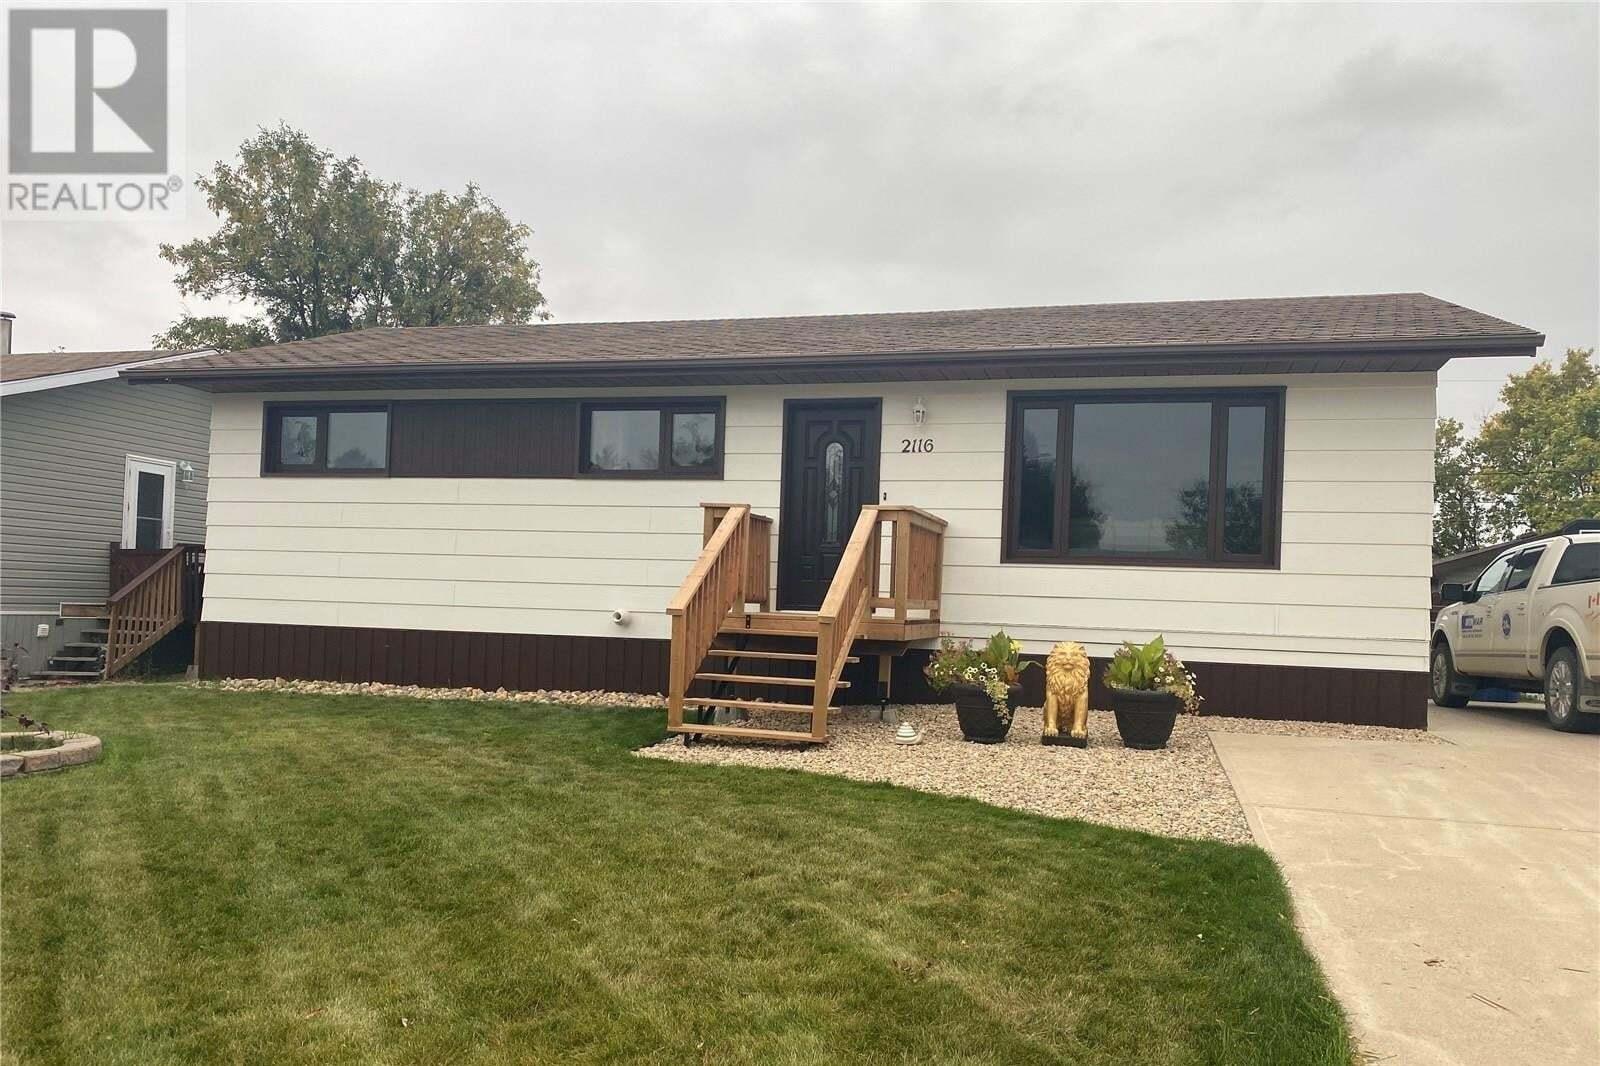 House for sale at 2116 100a St Tisdale Saskatchewan - MLS: SK827029